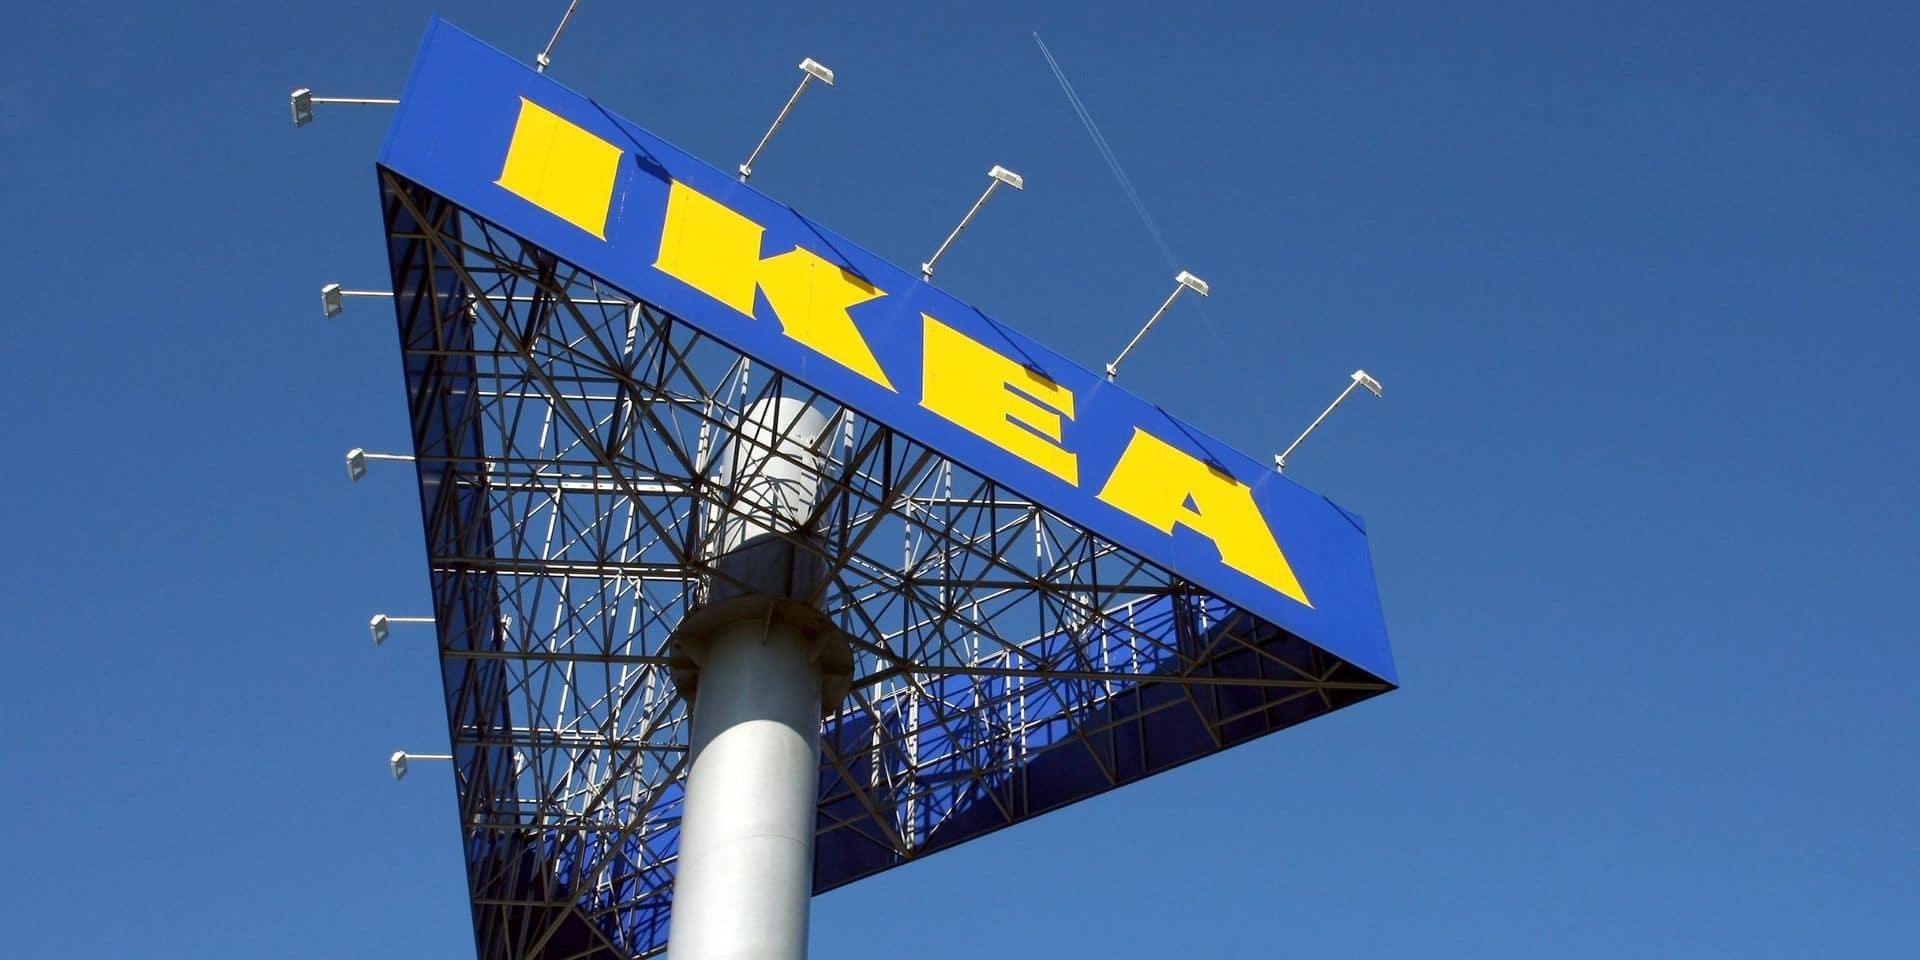 Ikea va investir près d'1,3 milliard d'euros en Chine